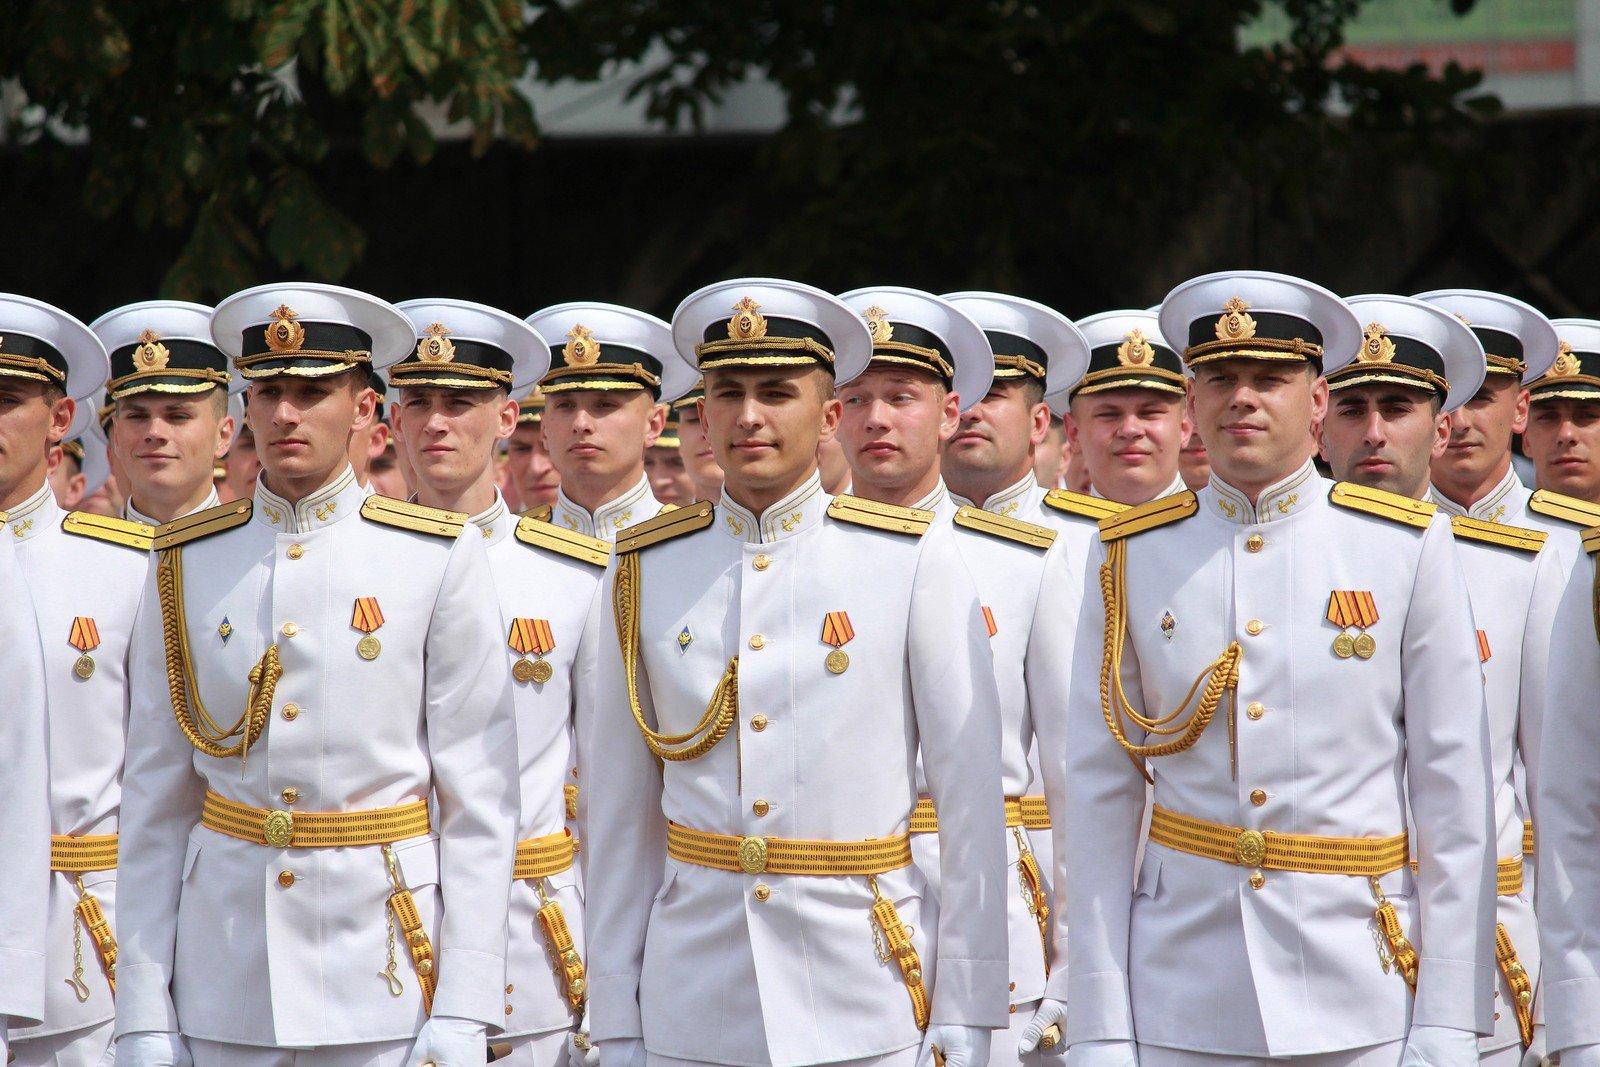 немого фото офицеров военно морского флота через три месяца